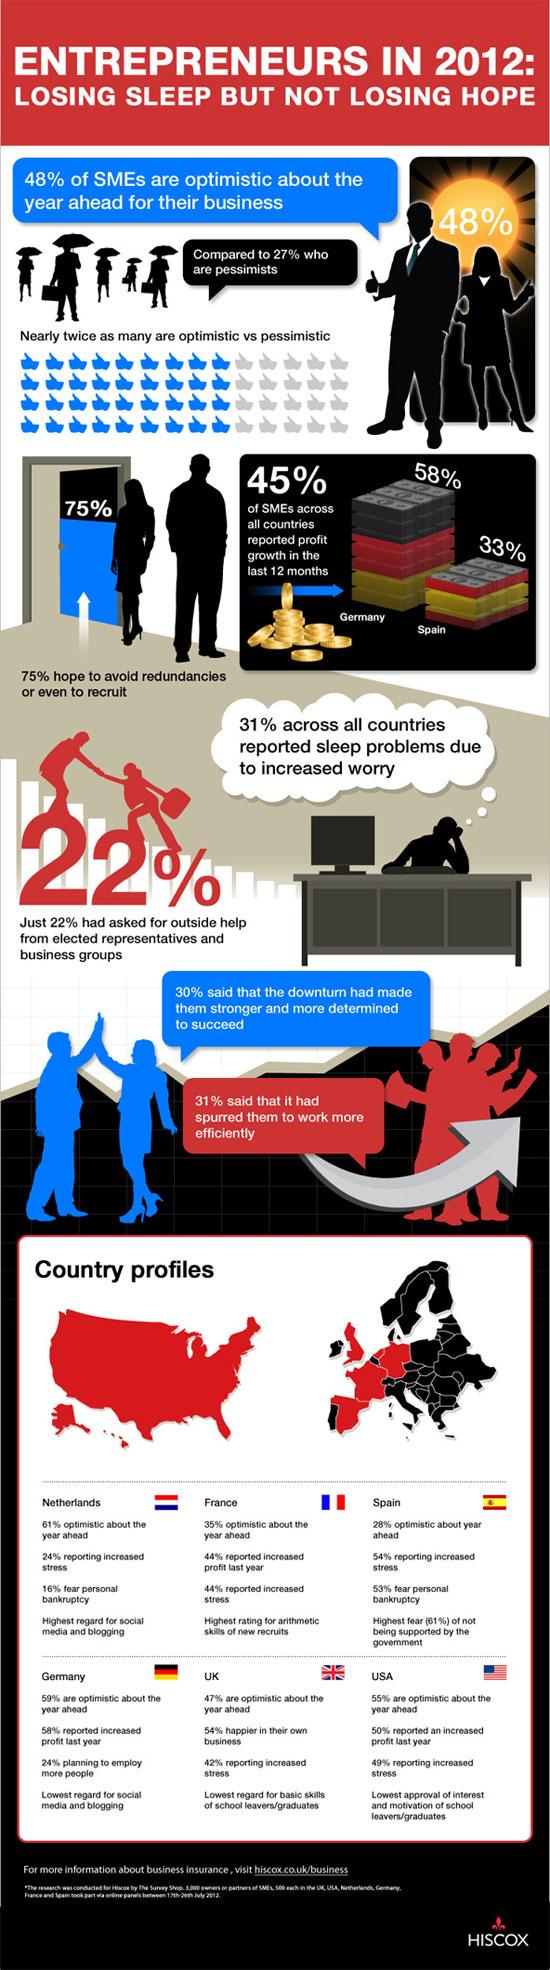 Entrepreneurs See Hope For The Economy Business survey